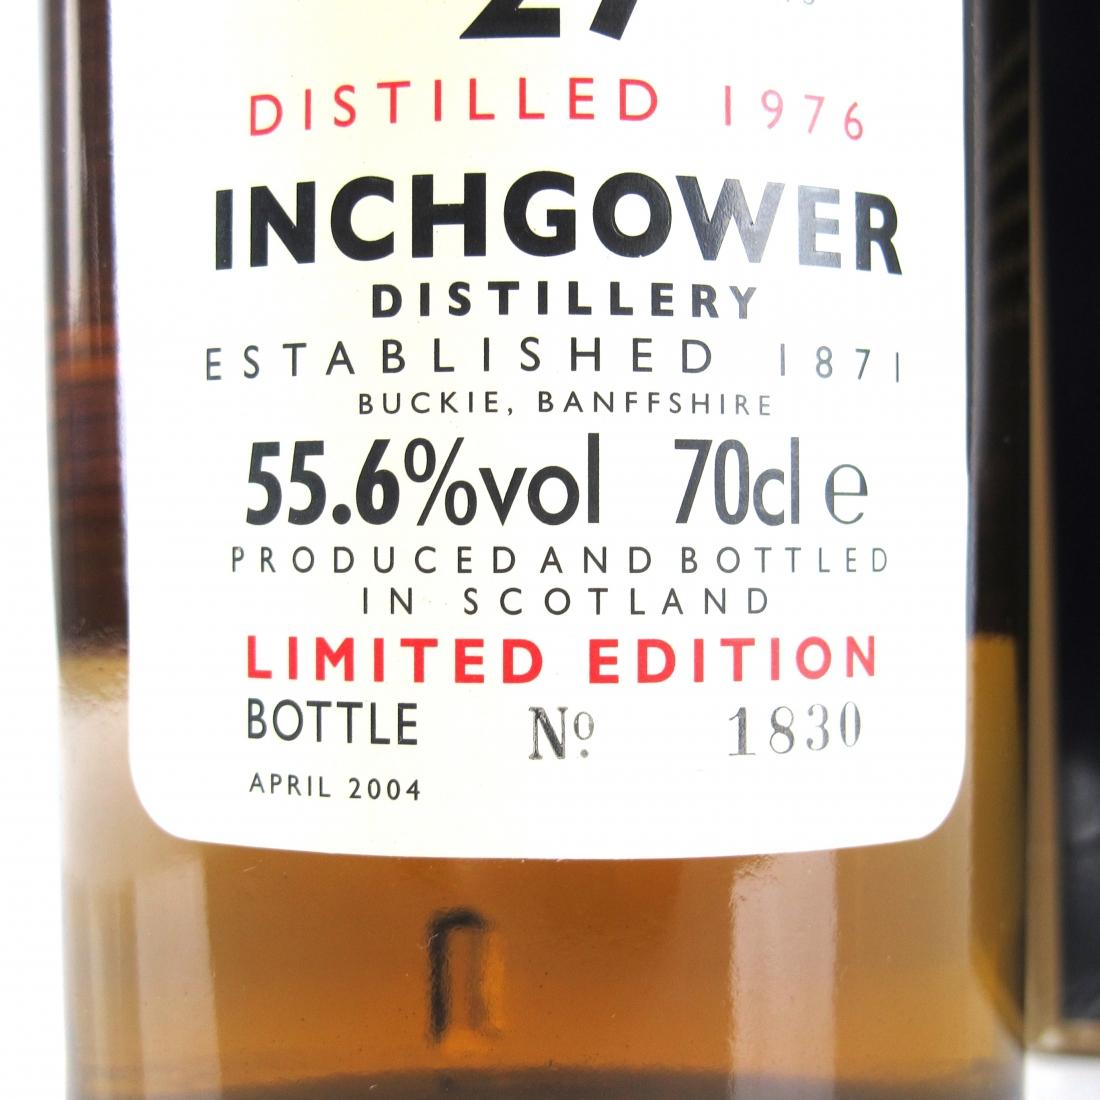 Inchgower 1976 Rare Malt 27 Year Old / 55.6%